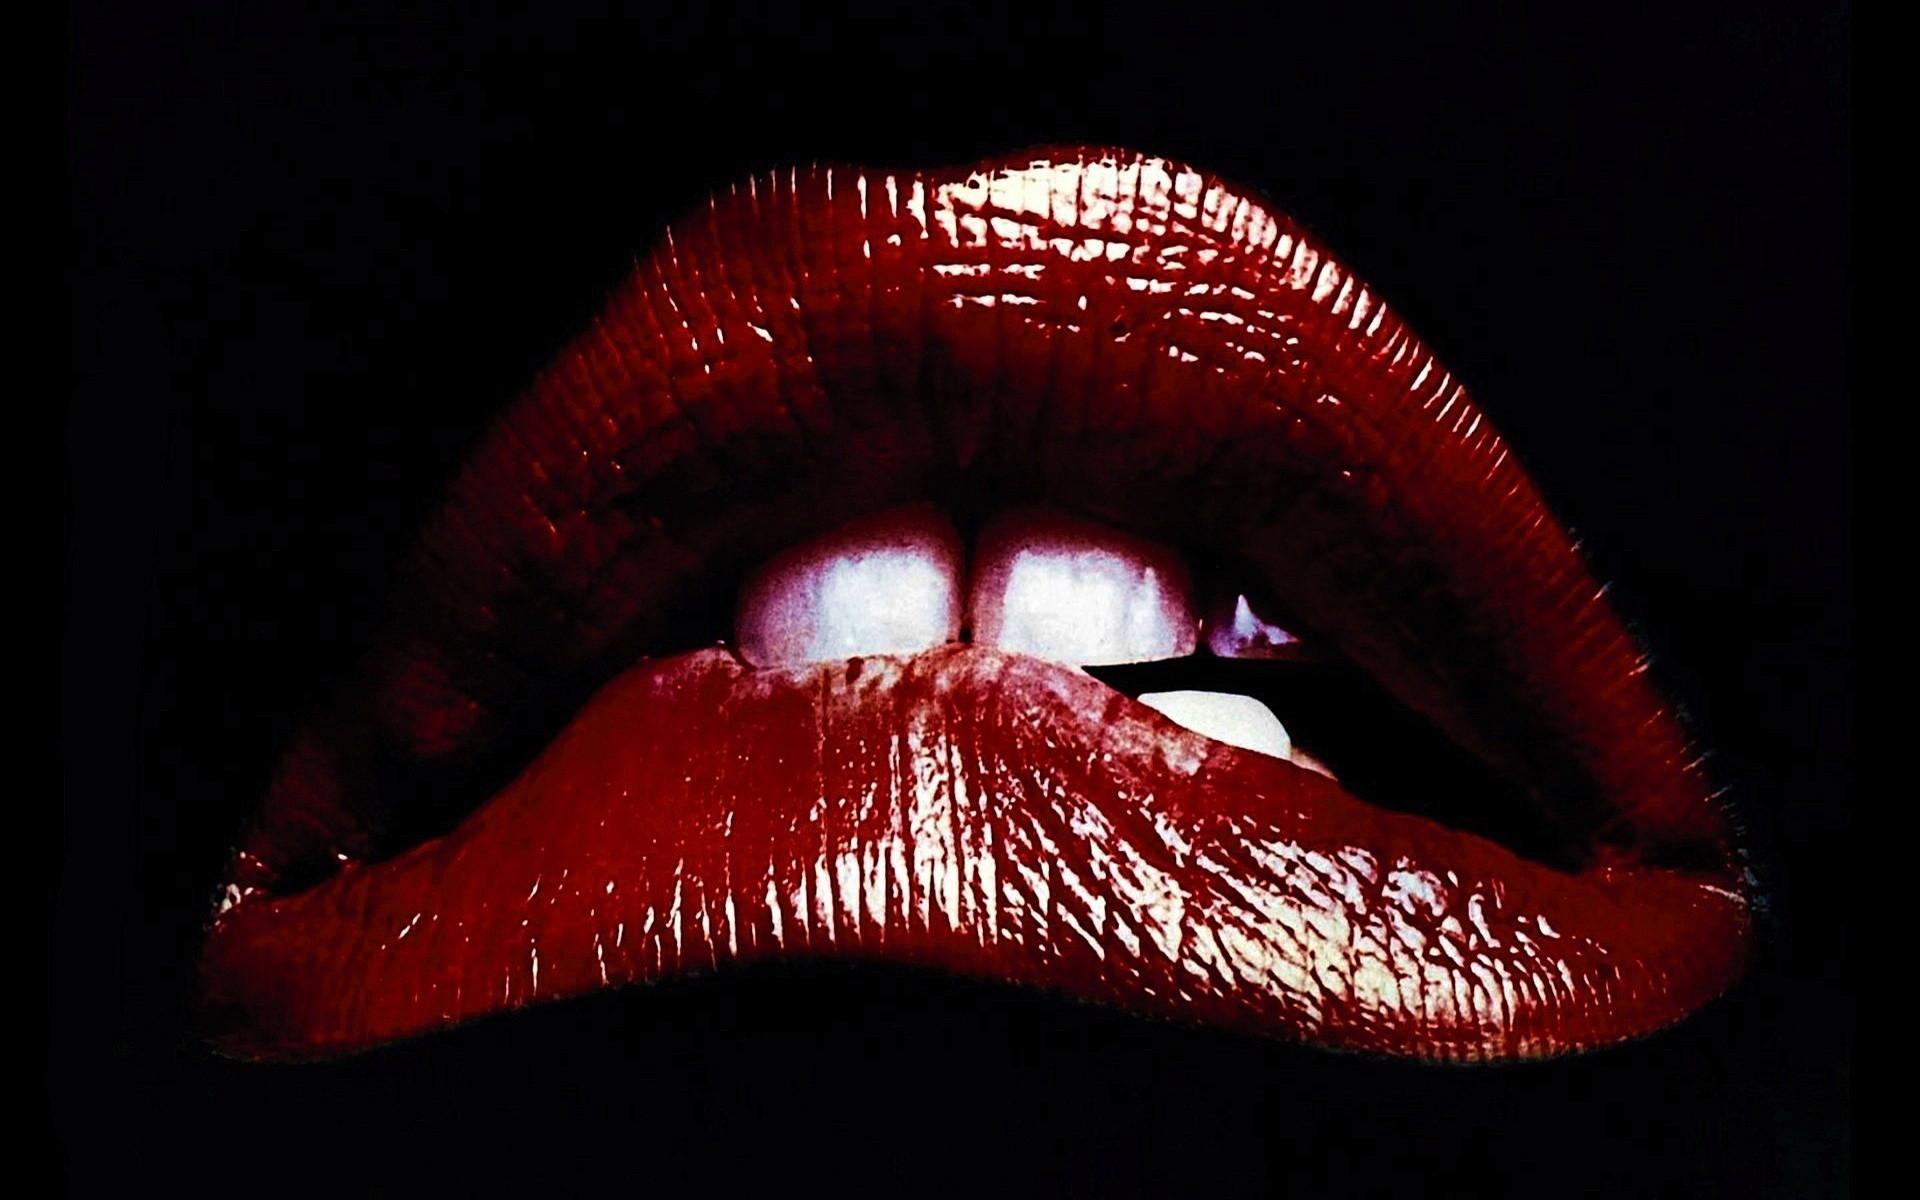 Free Horror Wallpaper HD For Android | ImageBank.biz